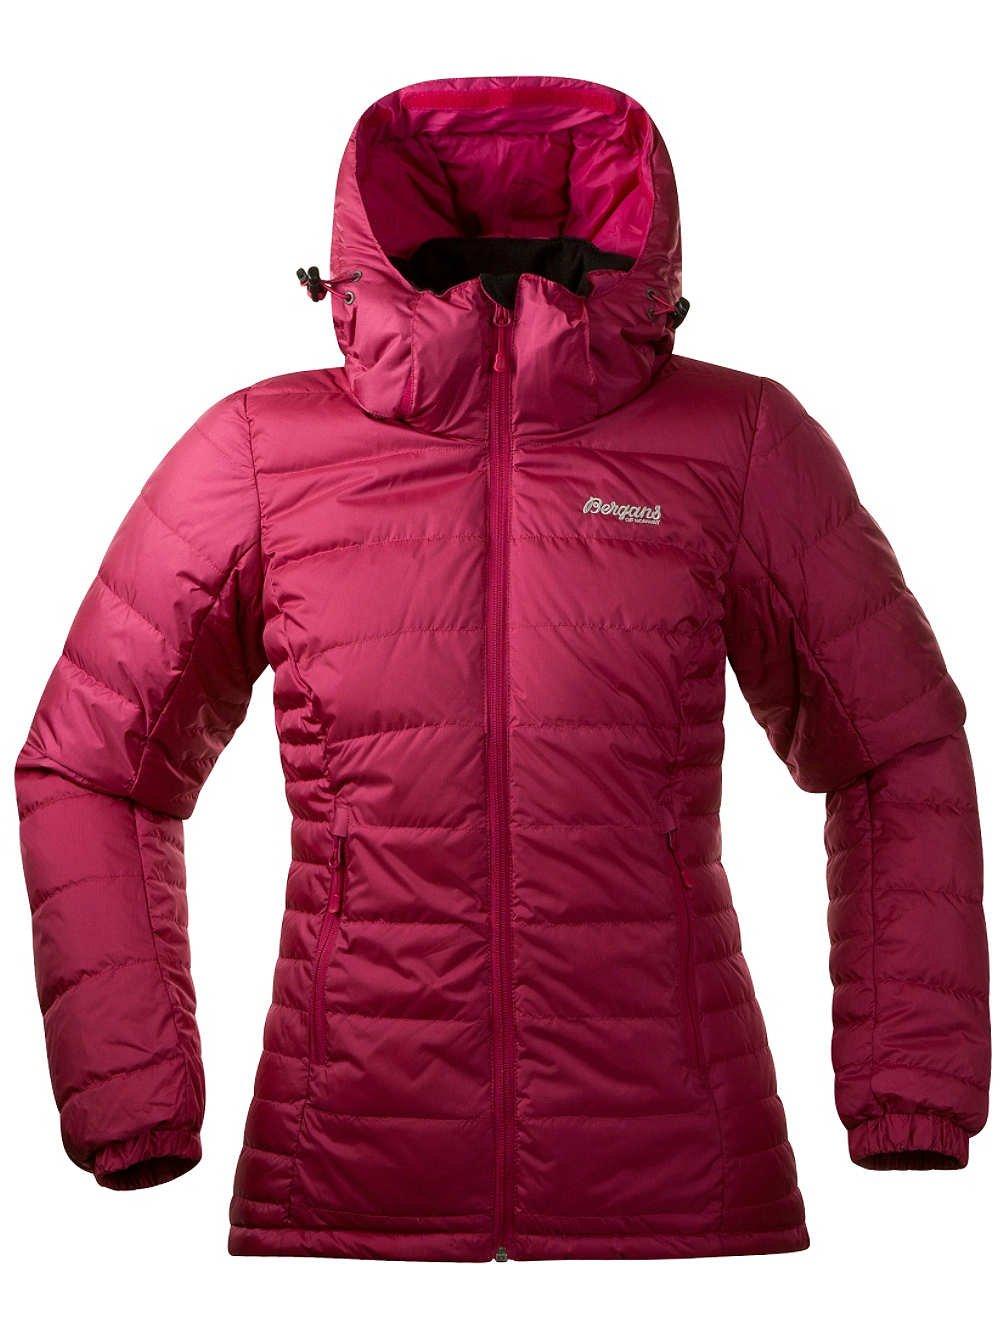 1b0ebb13df5 Jacket Women Bergans Rjukan Down Jacket: Amazon.co.uk: Clothing